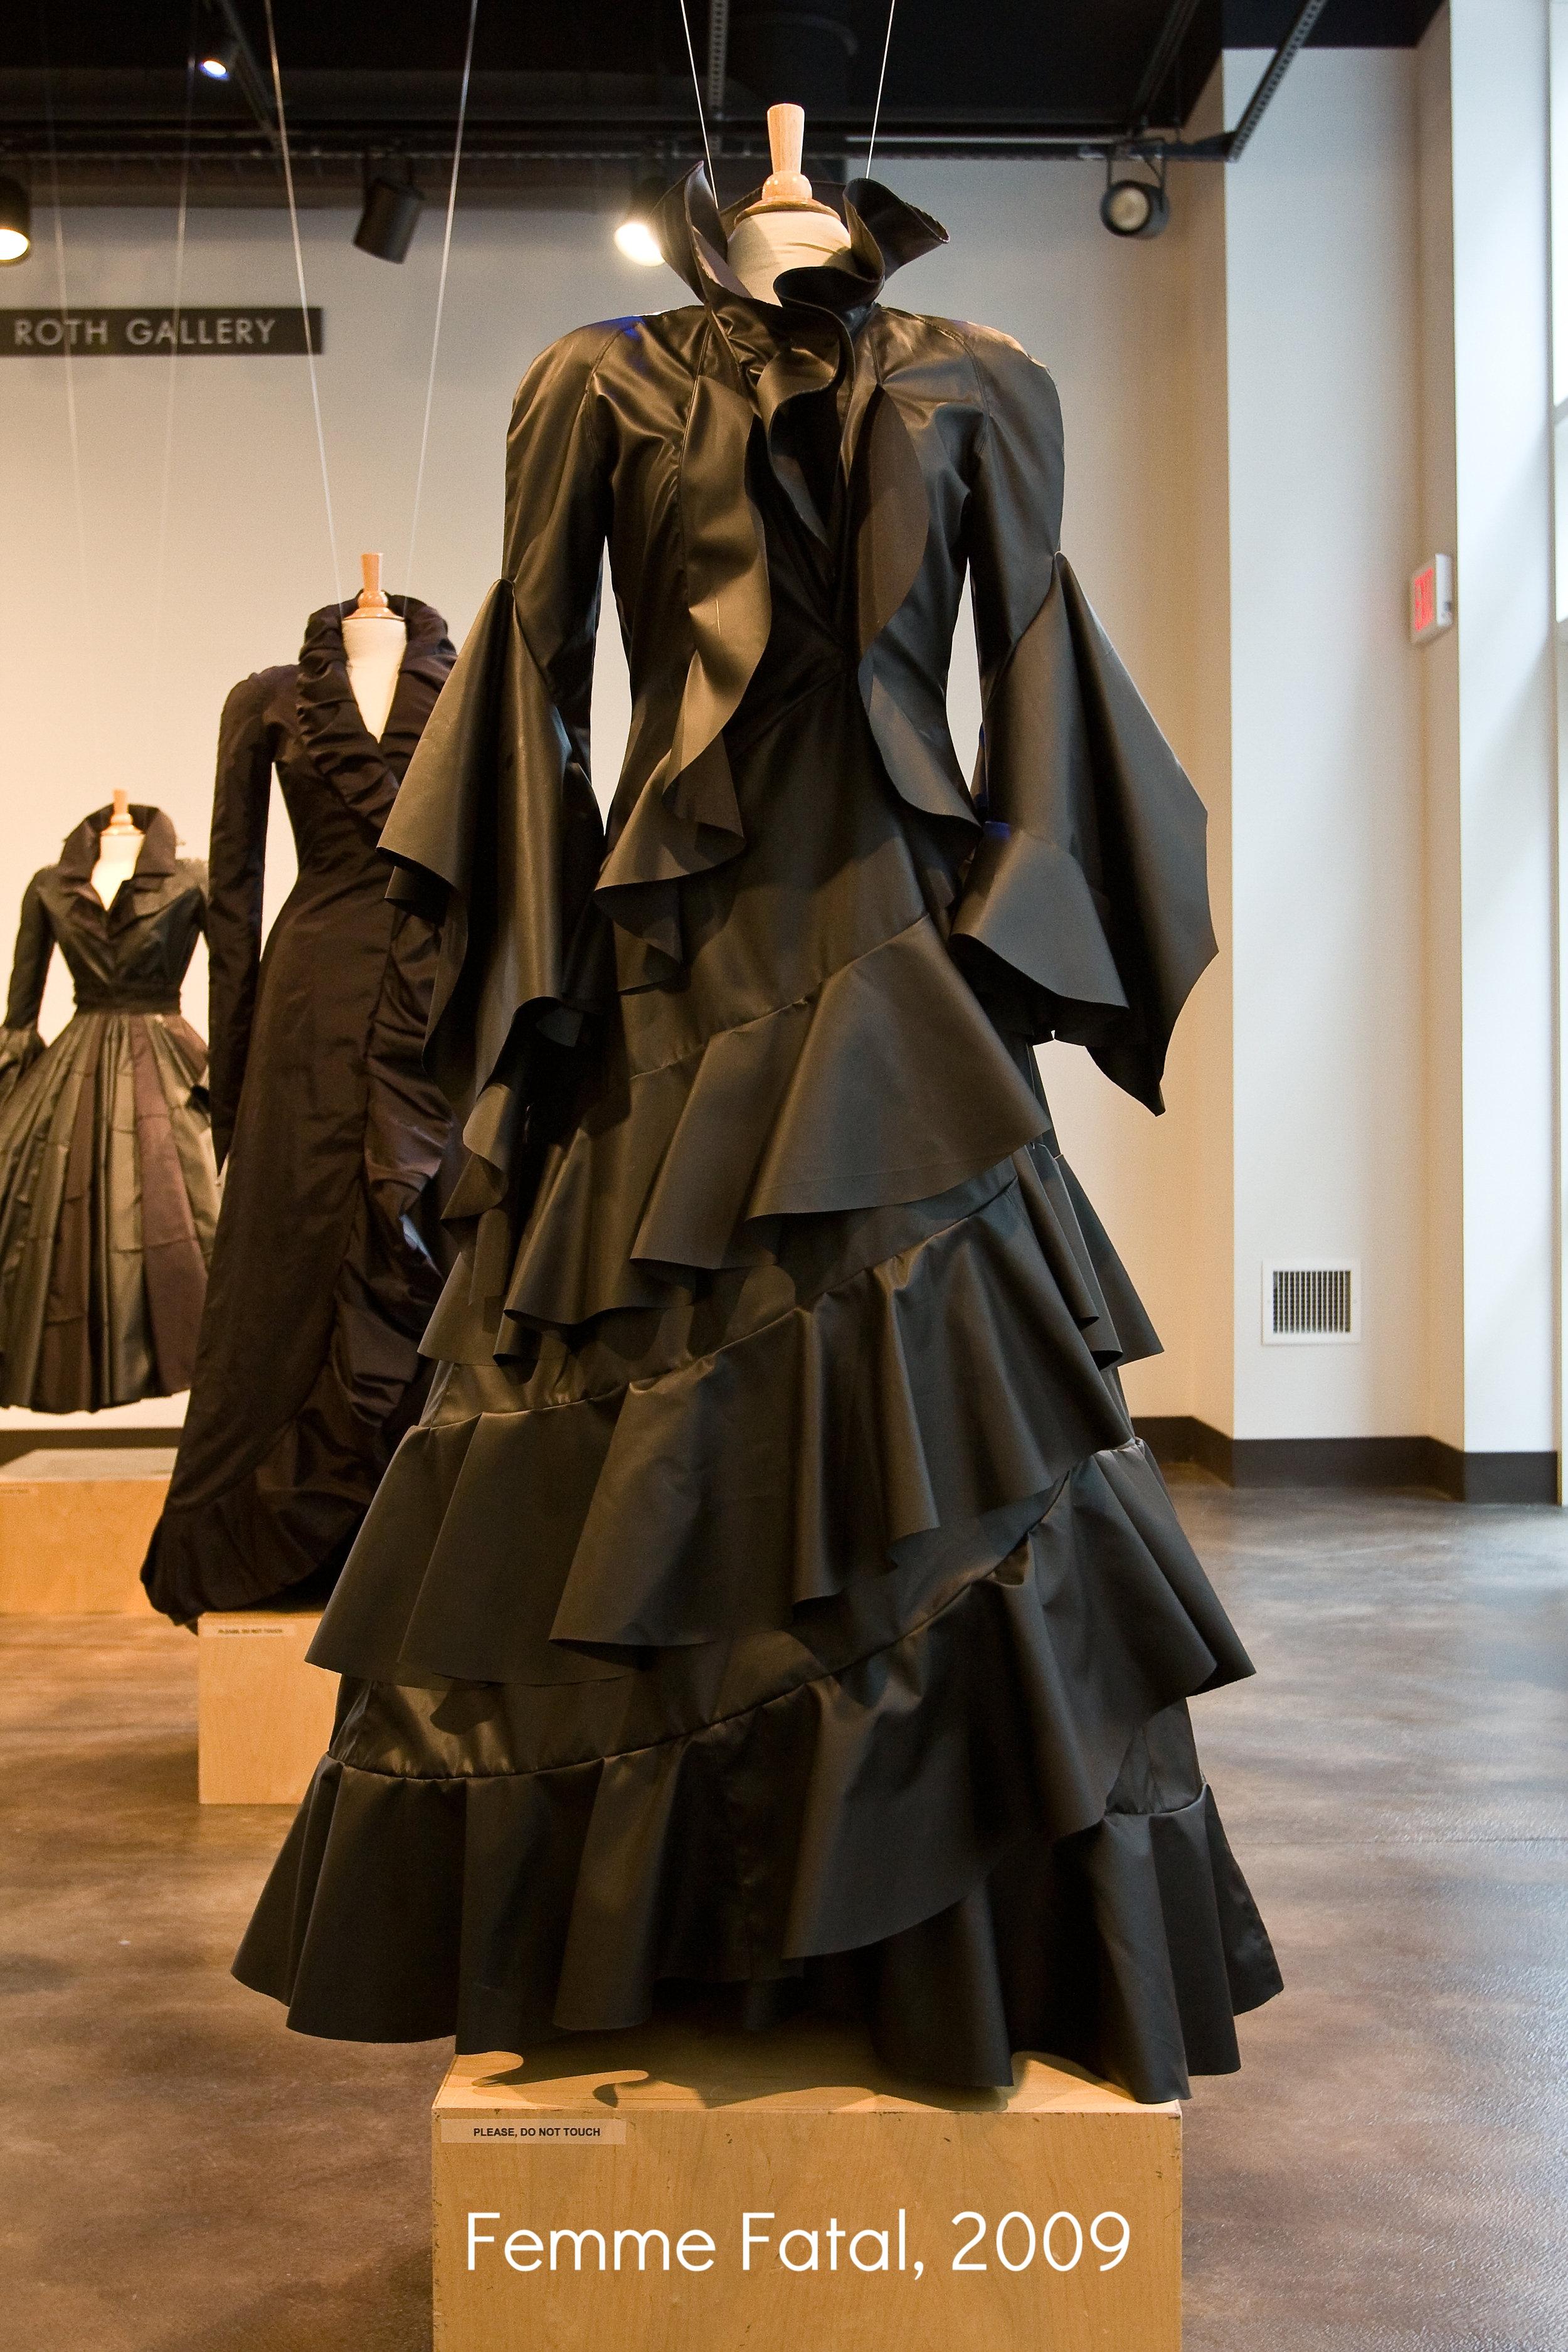 Femme Fatal, 2009